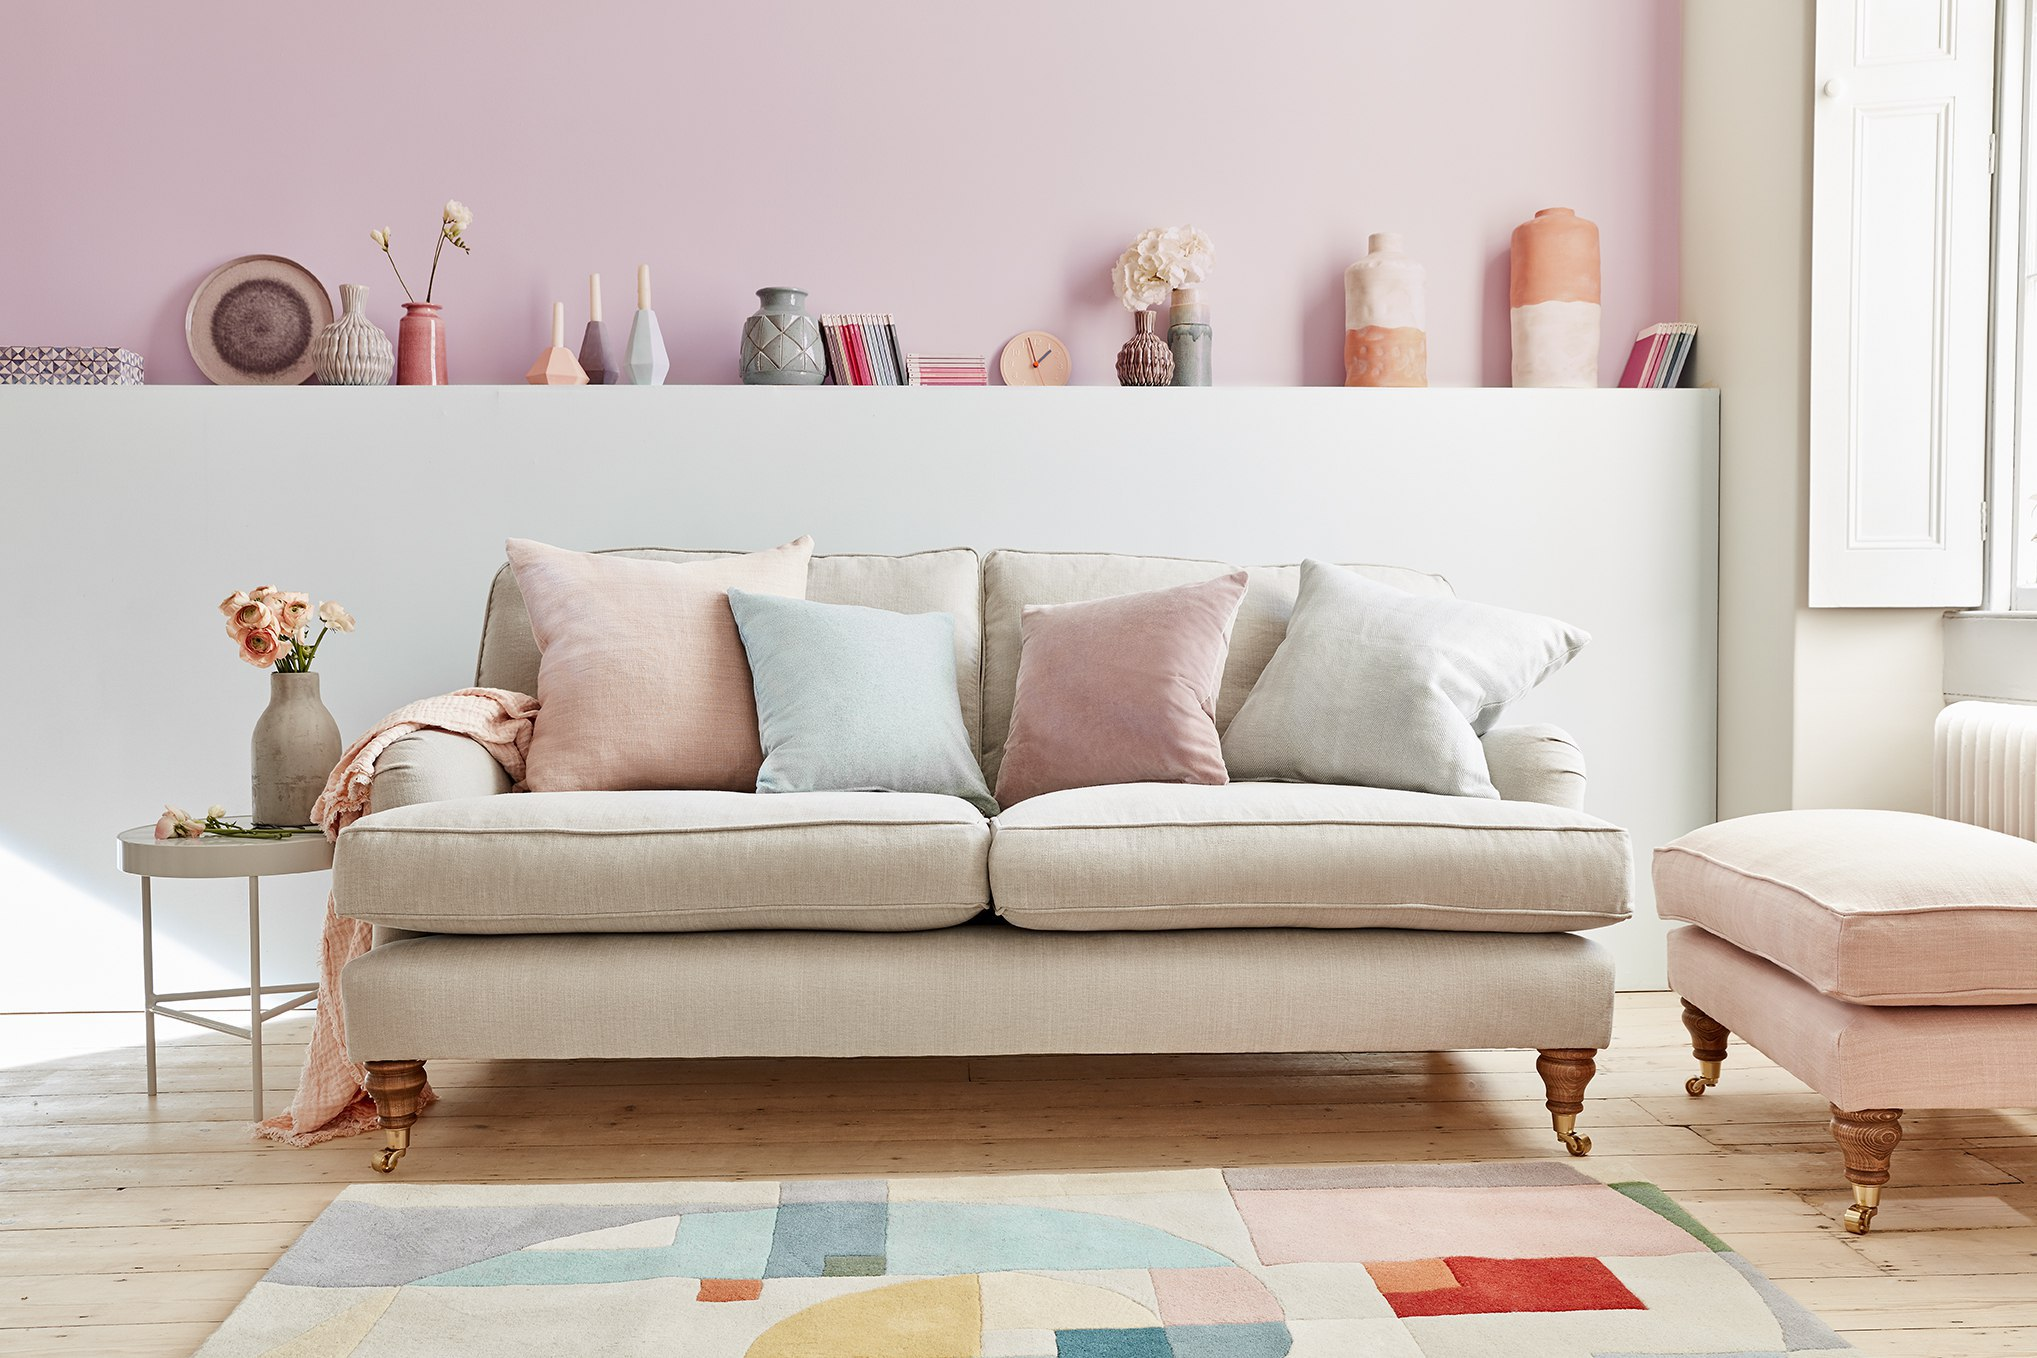 Sofa.com group gift.jpg